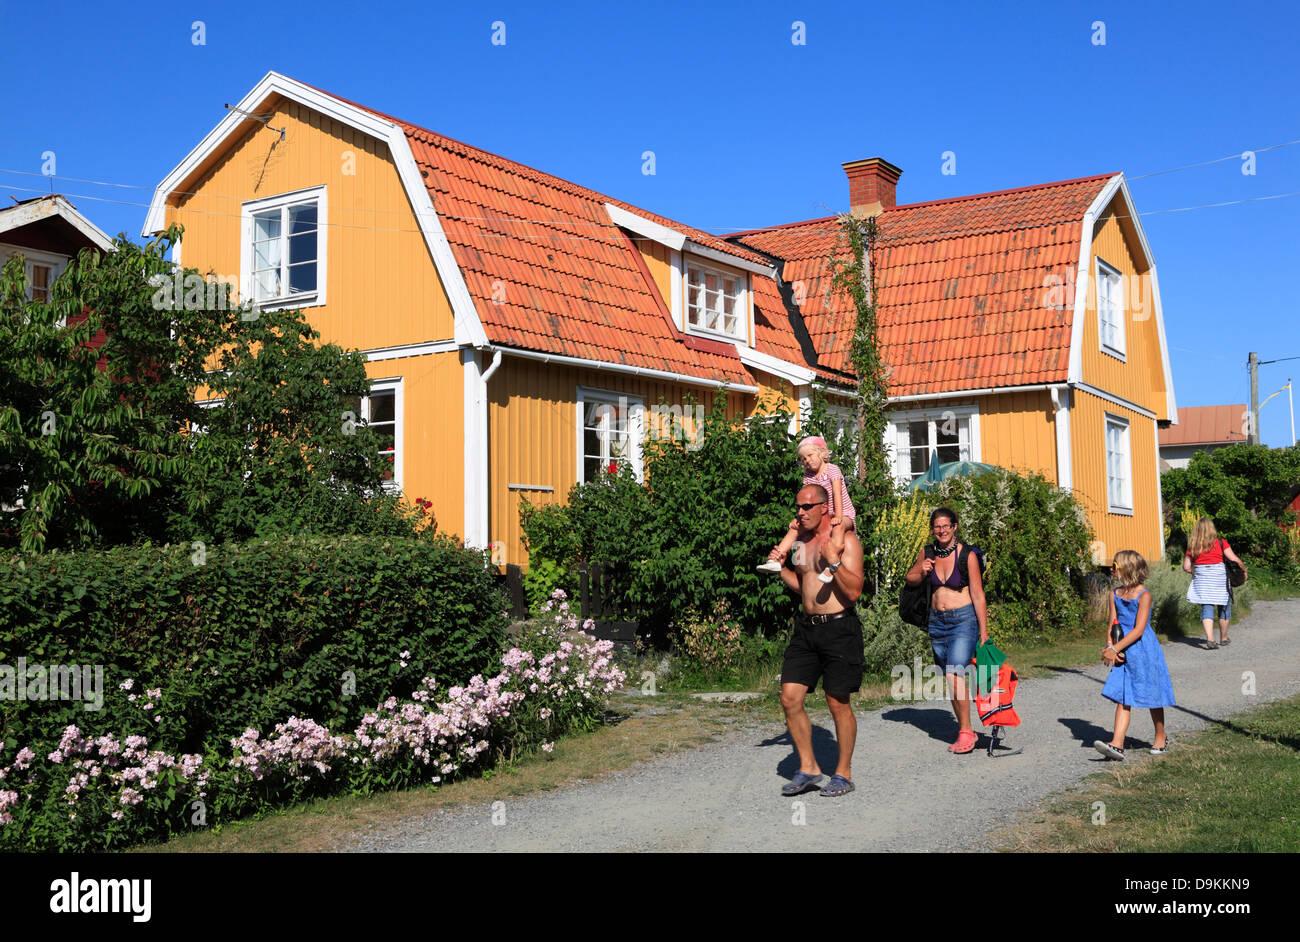 Landsort Island (Oeja), typical wooden houses, Stockholm Archipelago, baltic sea coast, Sweden, Scandinavia Stock Photo